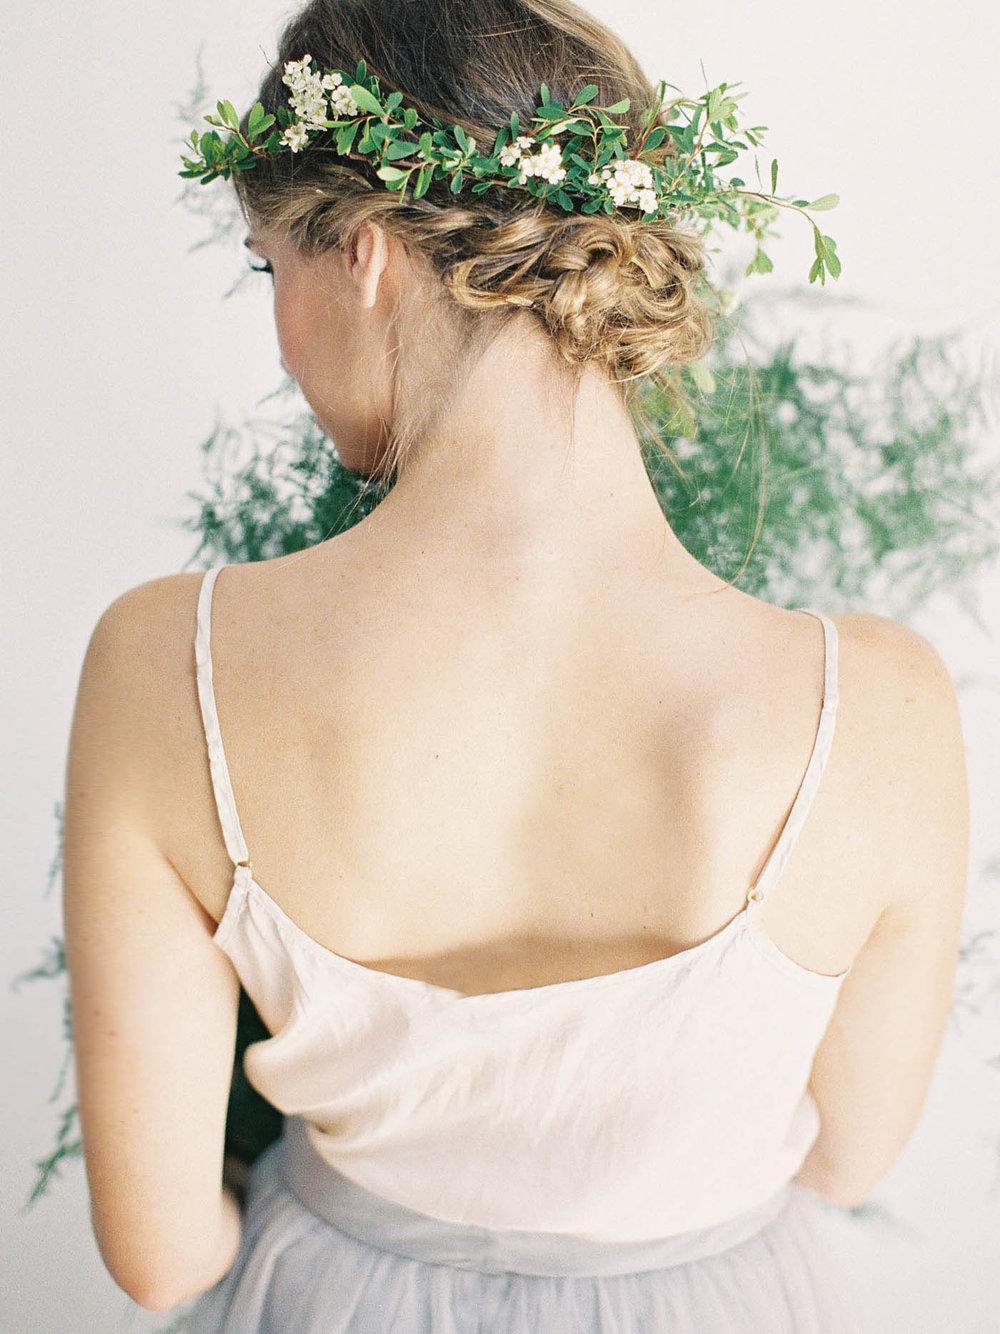 floral-crown-12-Jen_Huang-006838-R1-E025.jpg